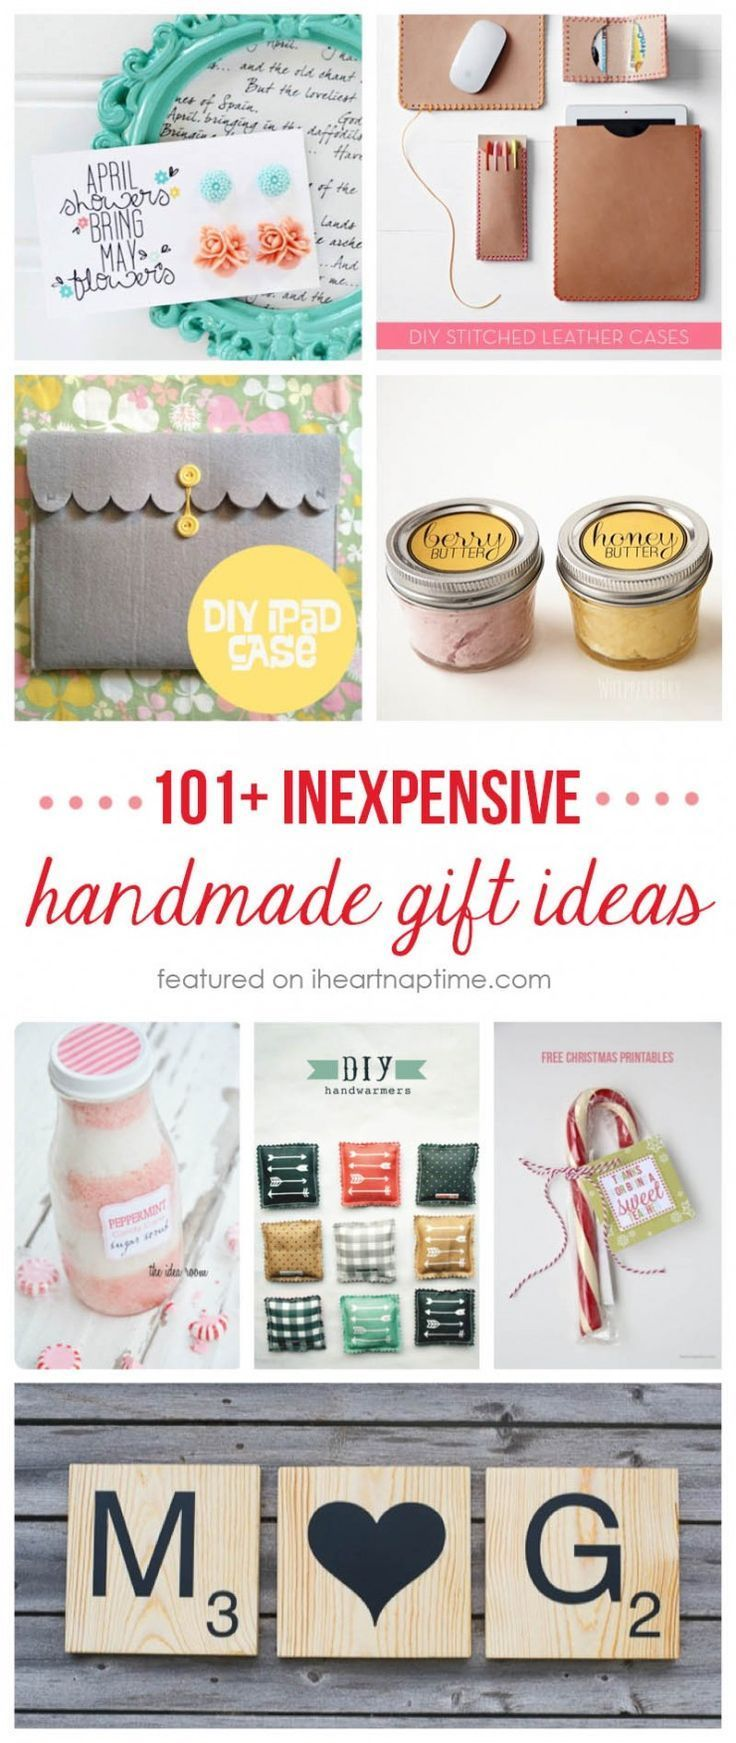 101+ inexpensive handmade Christmas gifts on http://iheartnaptime ...